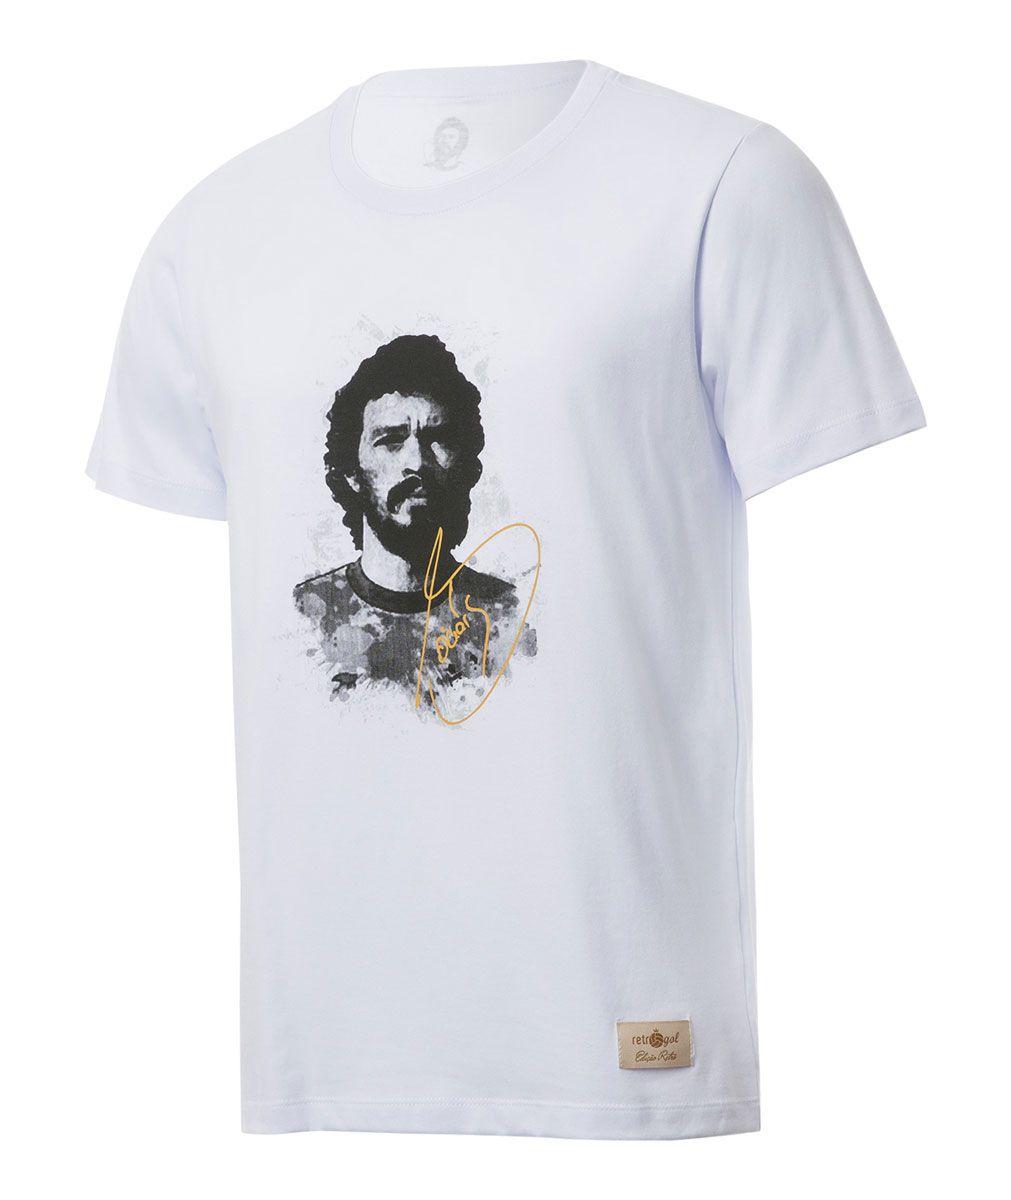 1c465c3cfc71d Camisa Retrô Gol Sócrates Ex - Corinthians Rosto Branca Torcedor